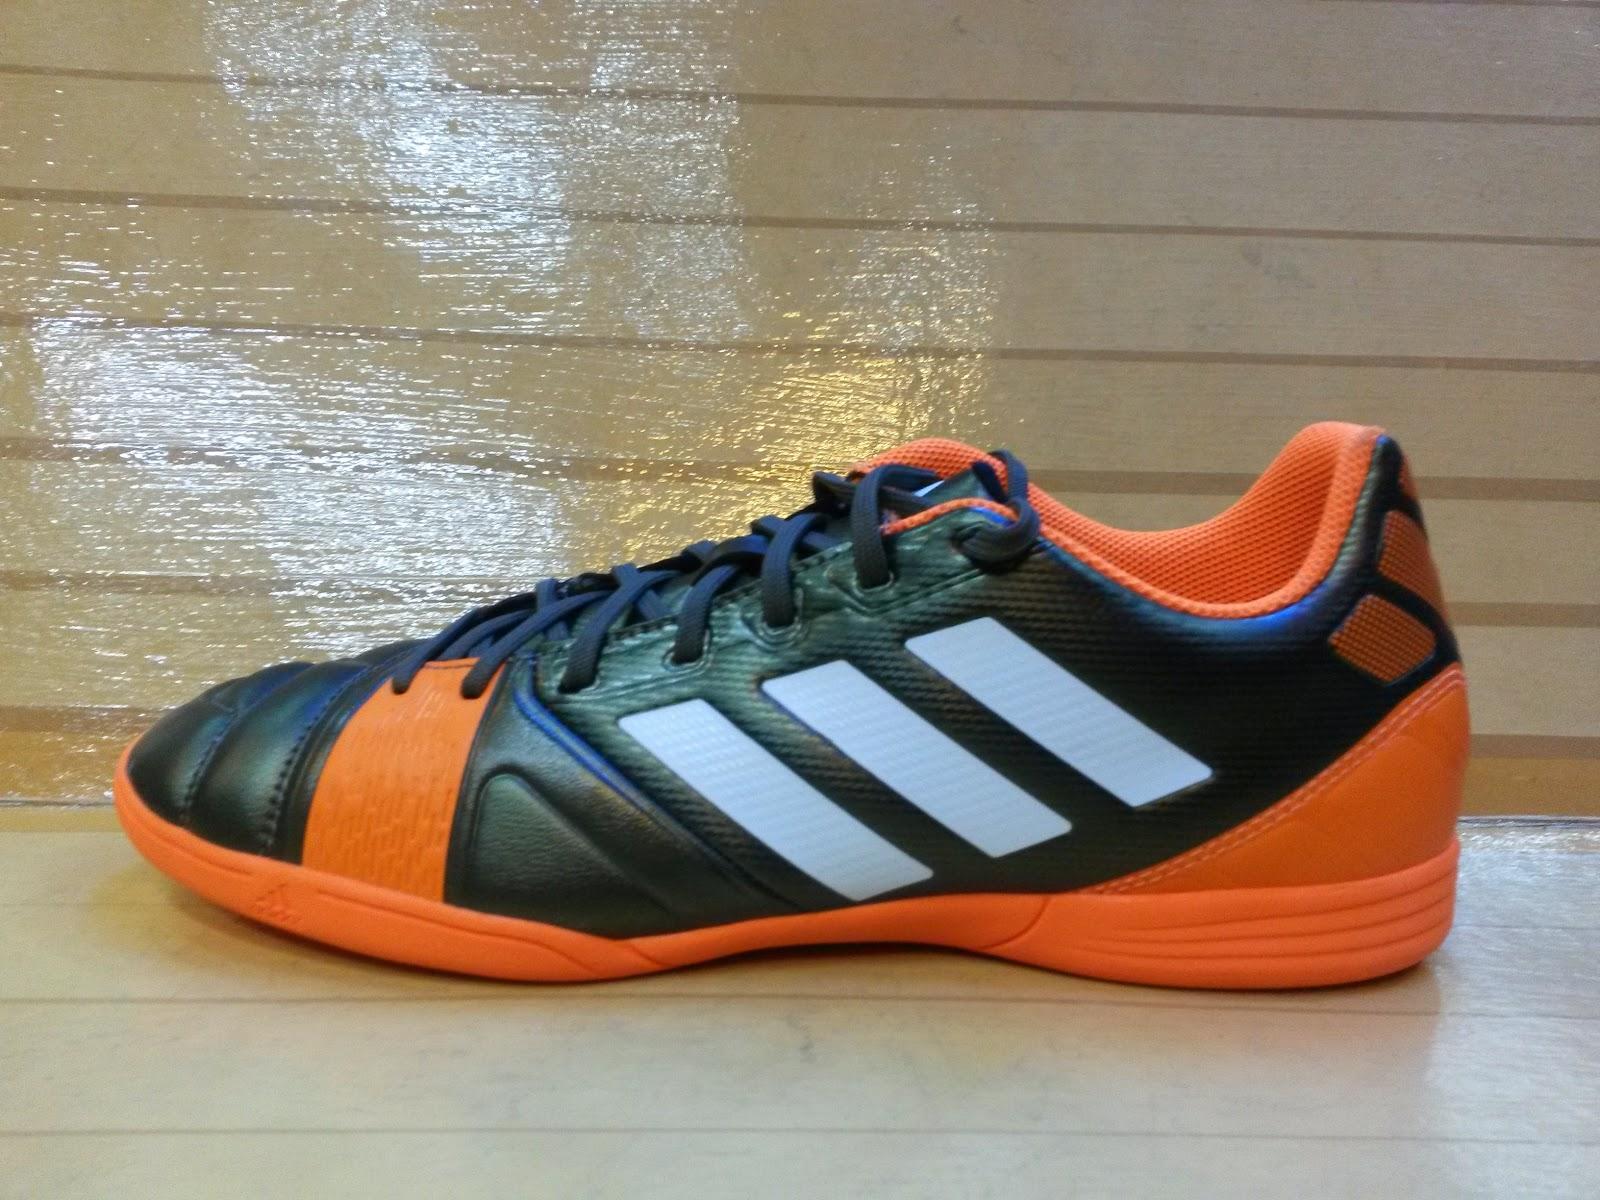 Adidas Nitrocharge 3.0 Futsal Original